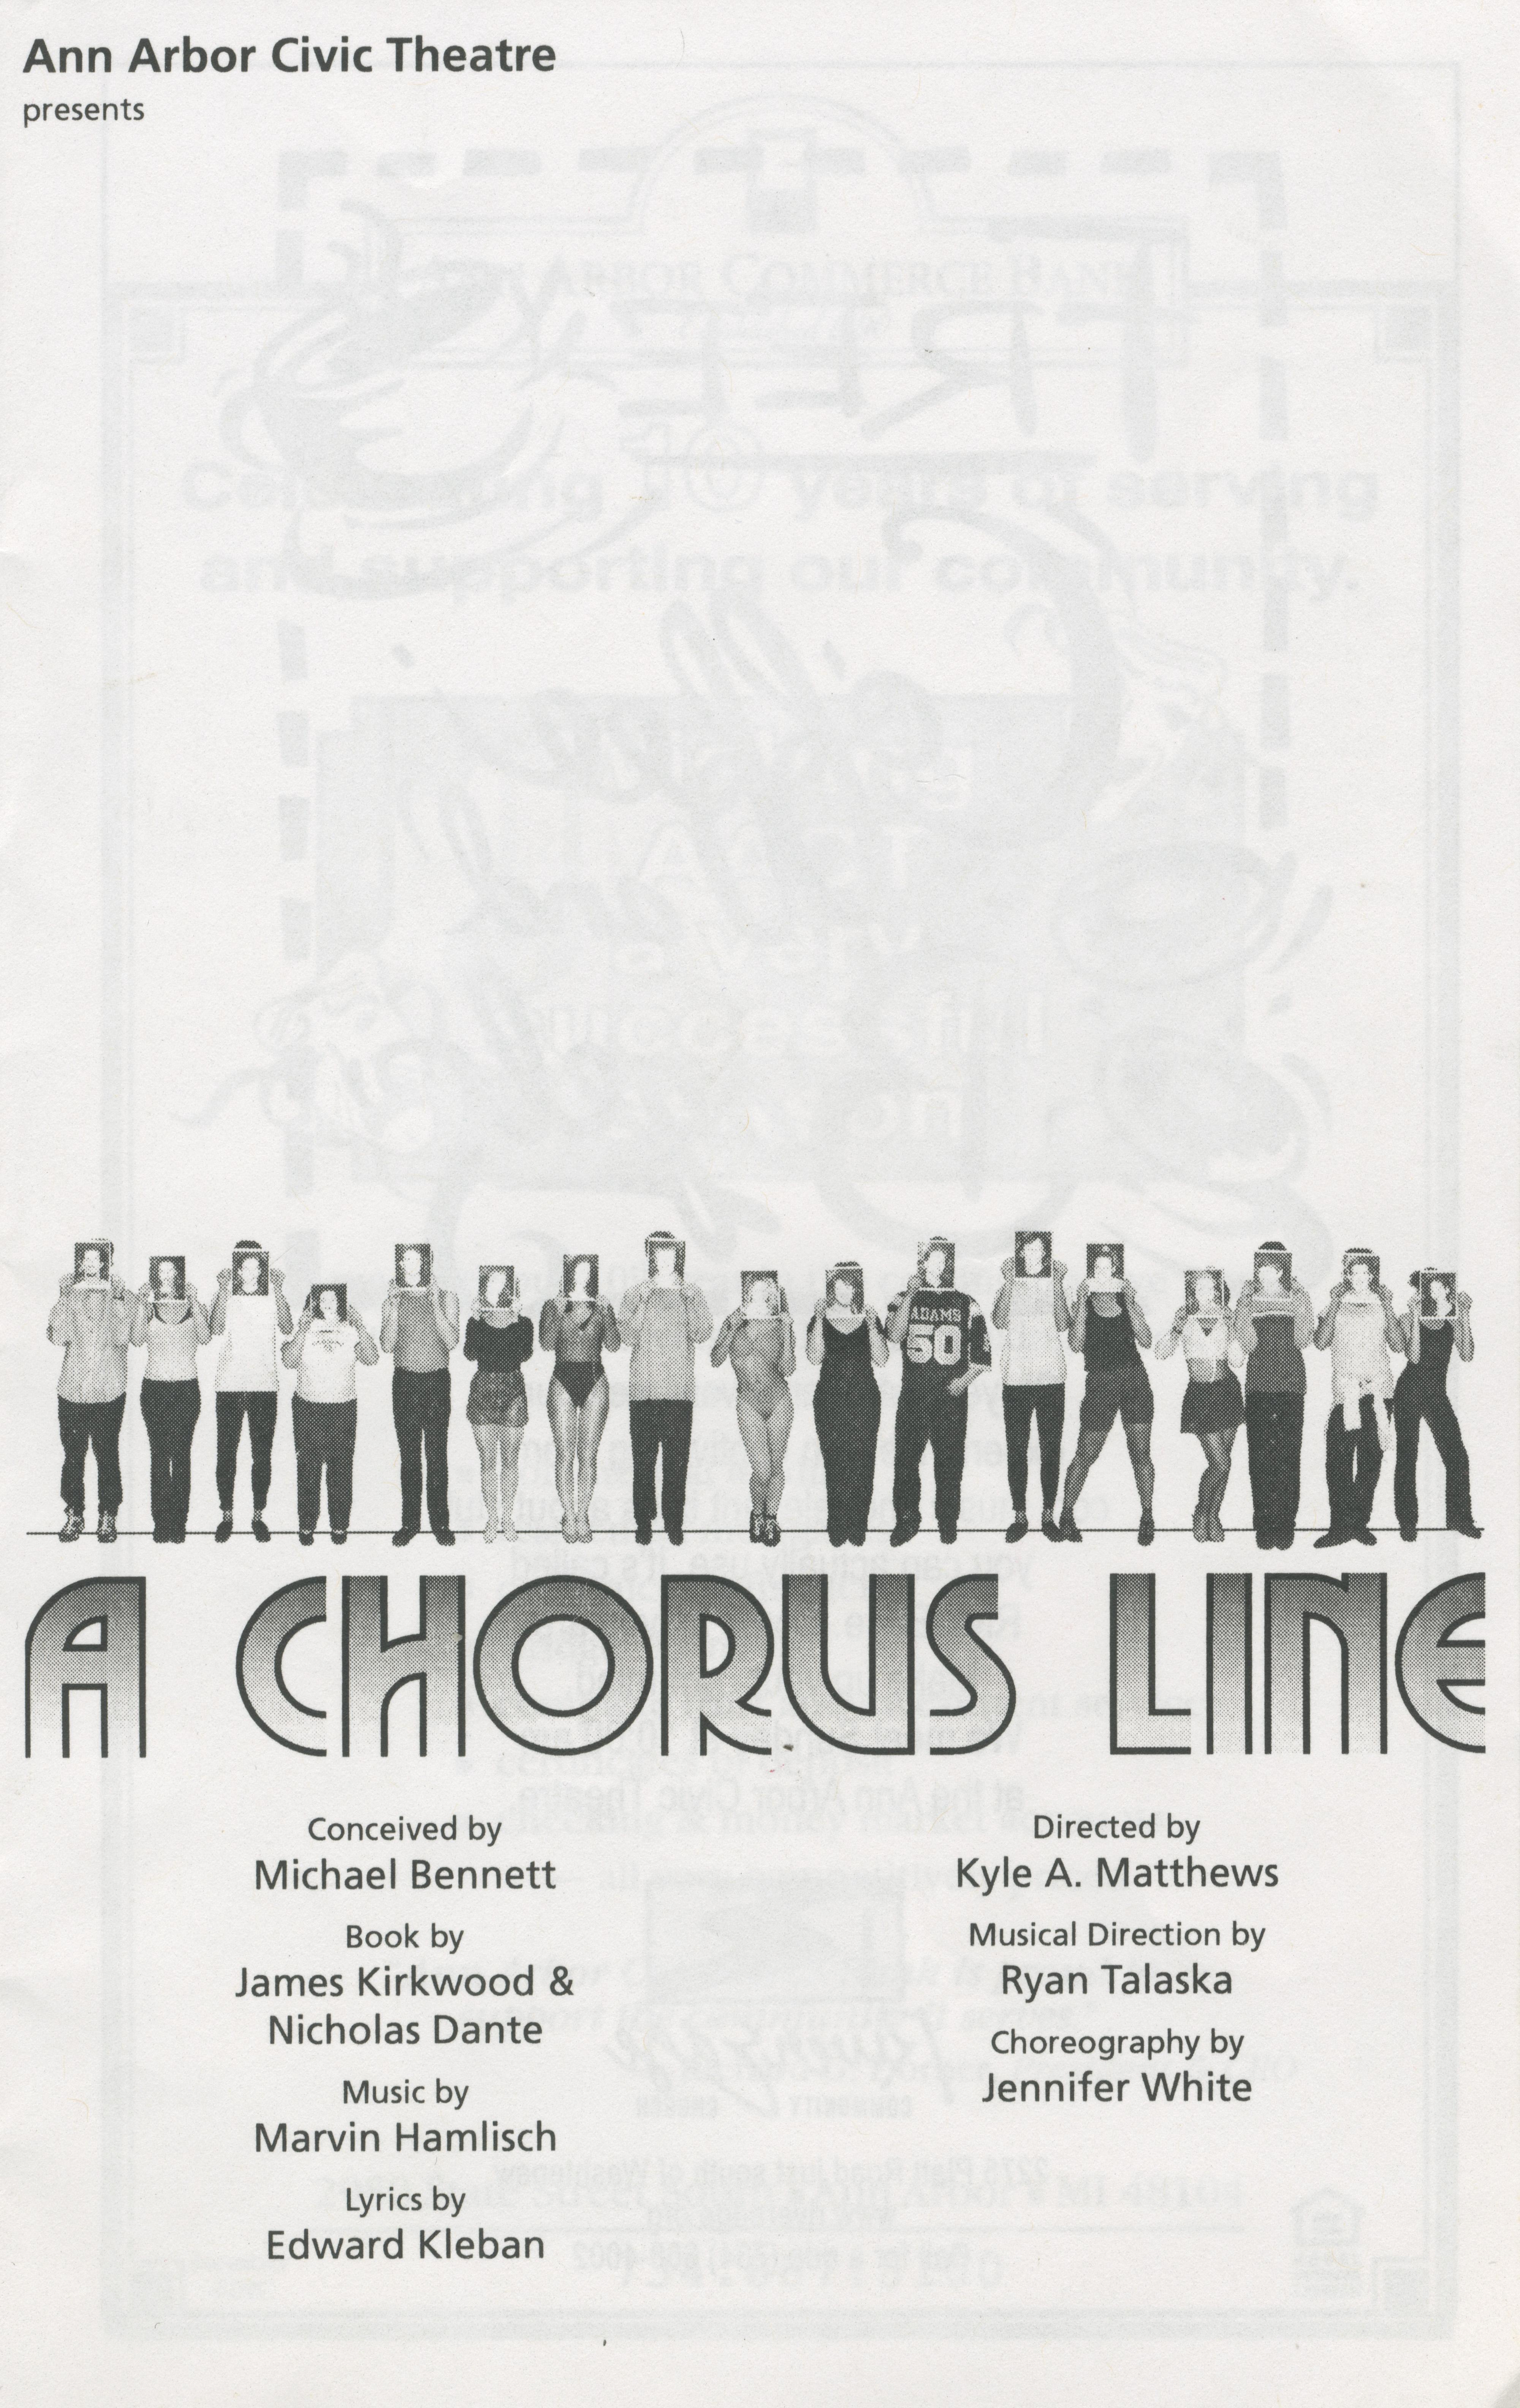 ann arbor civic theatre program  a chorus line  may 03